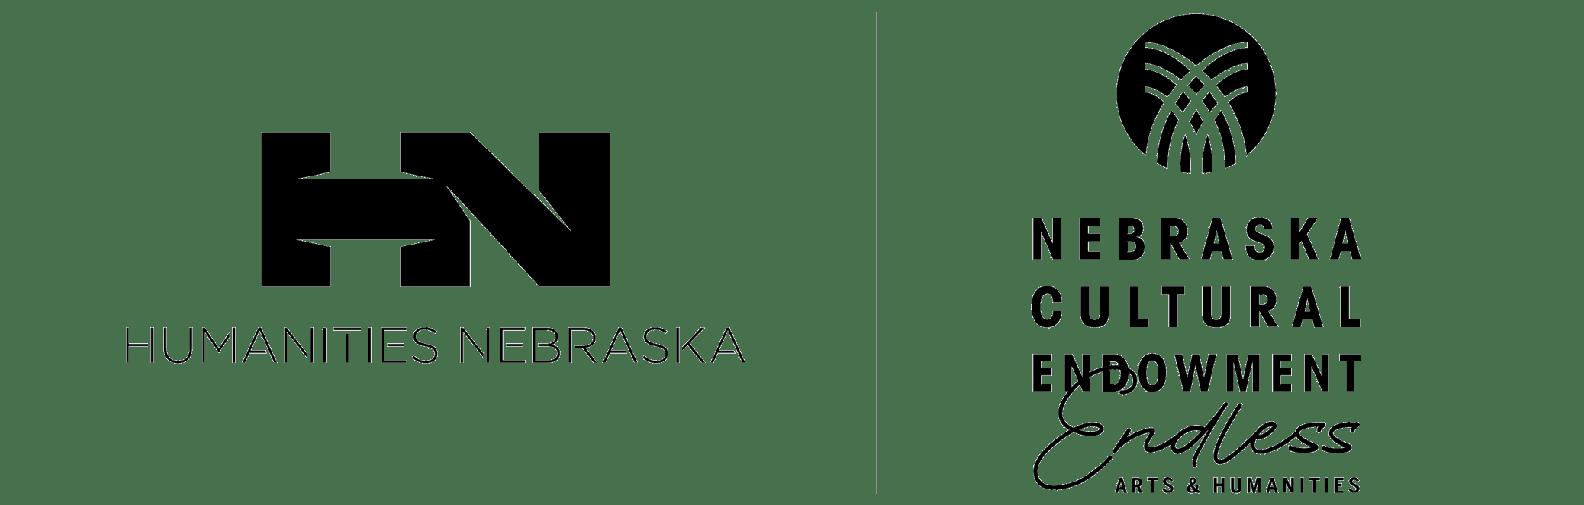 Humanities Nebraska & NE Cultural Endowment